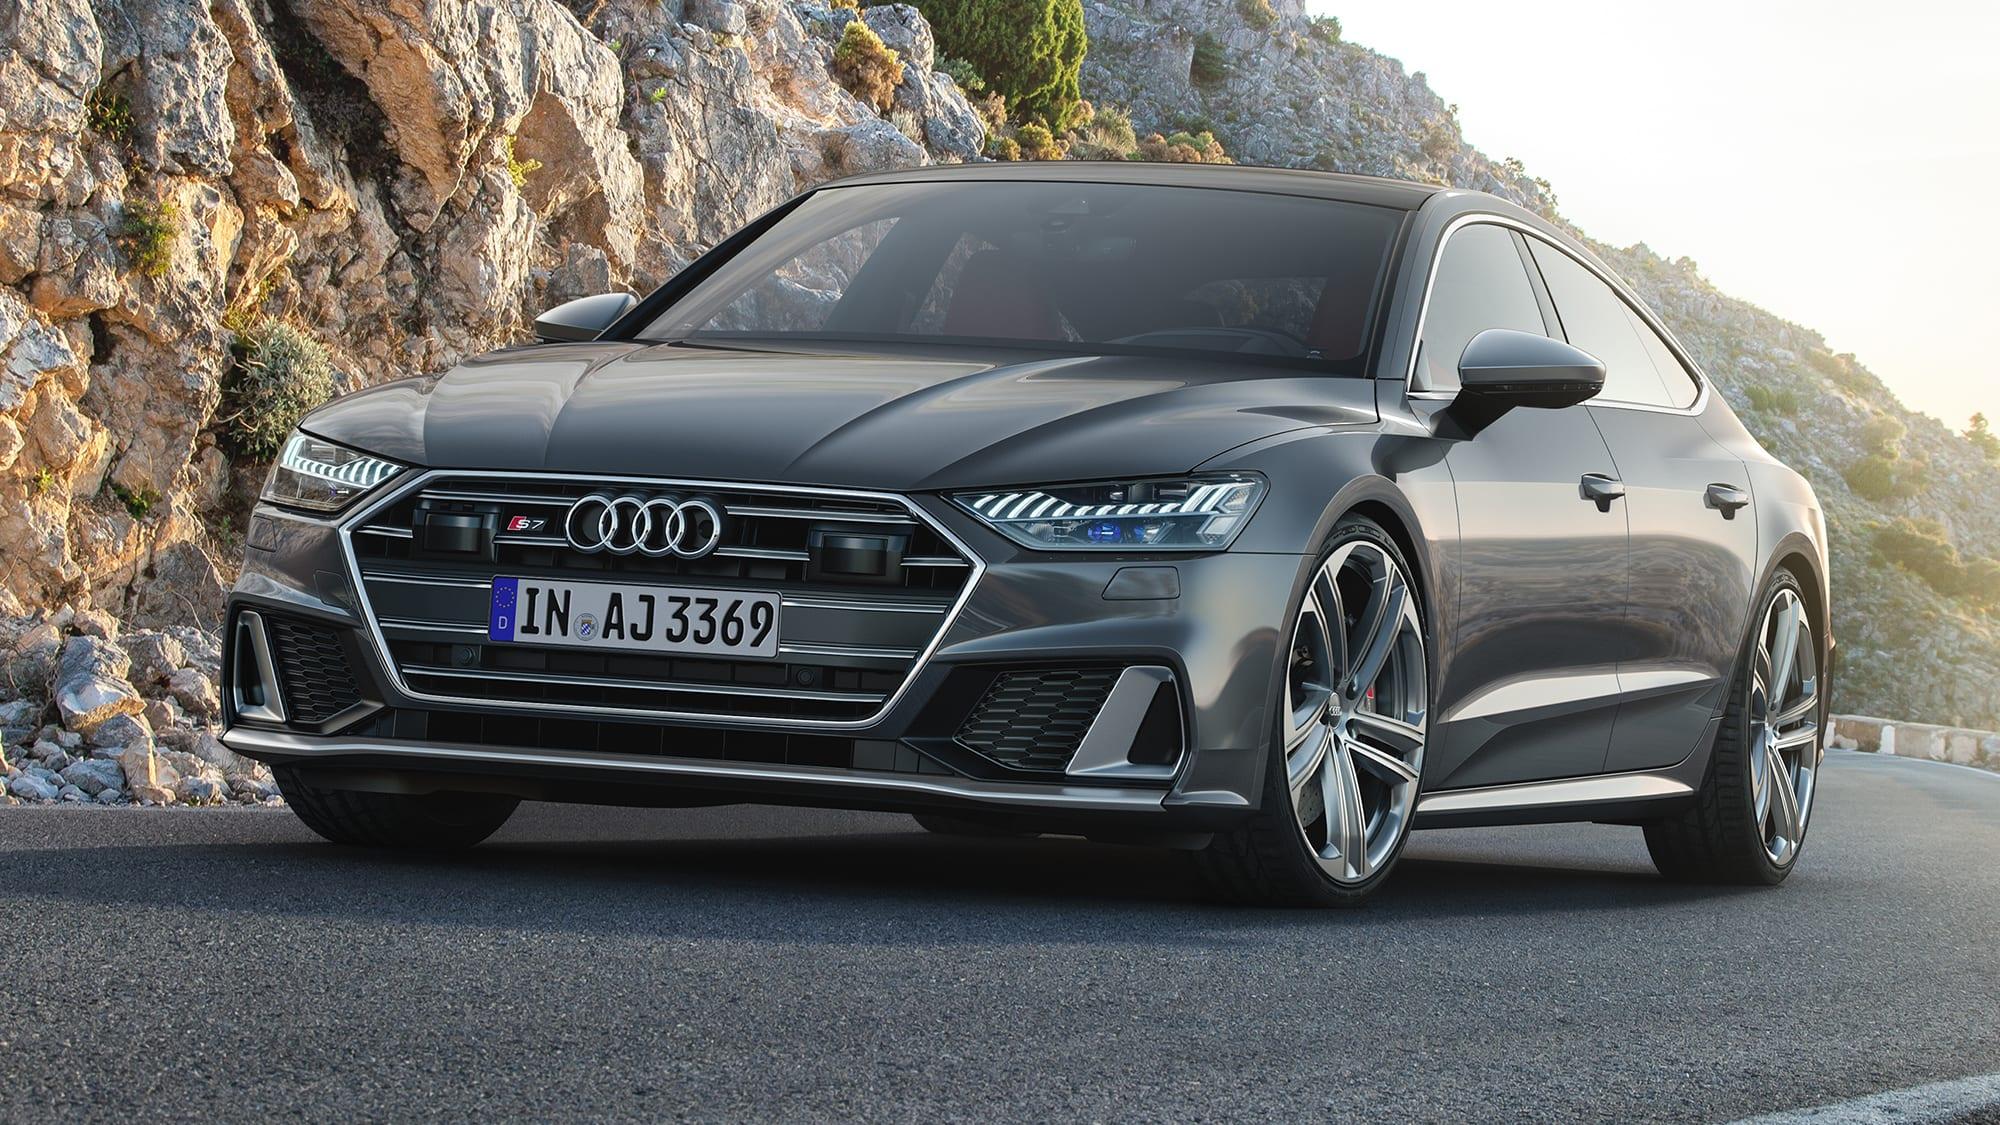 2020 Audi S6, S7 revealed